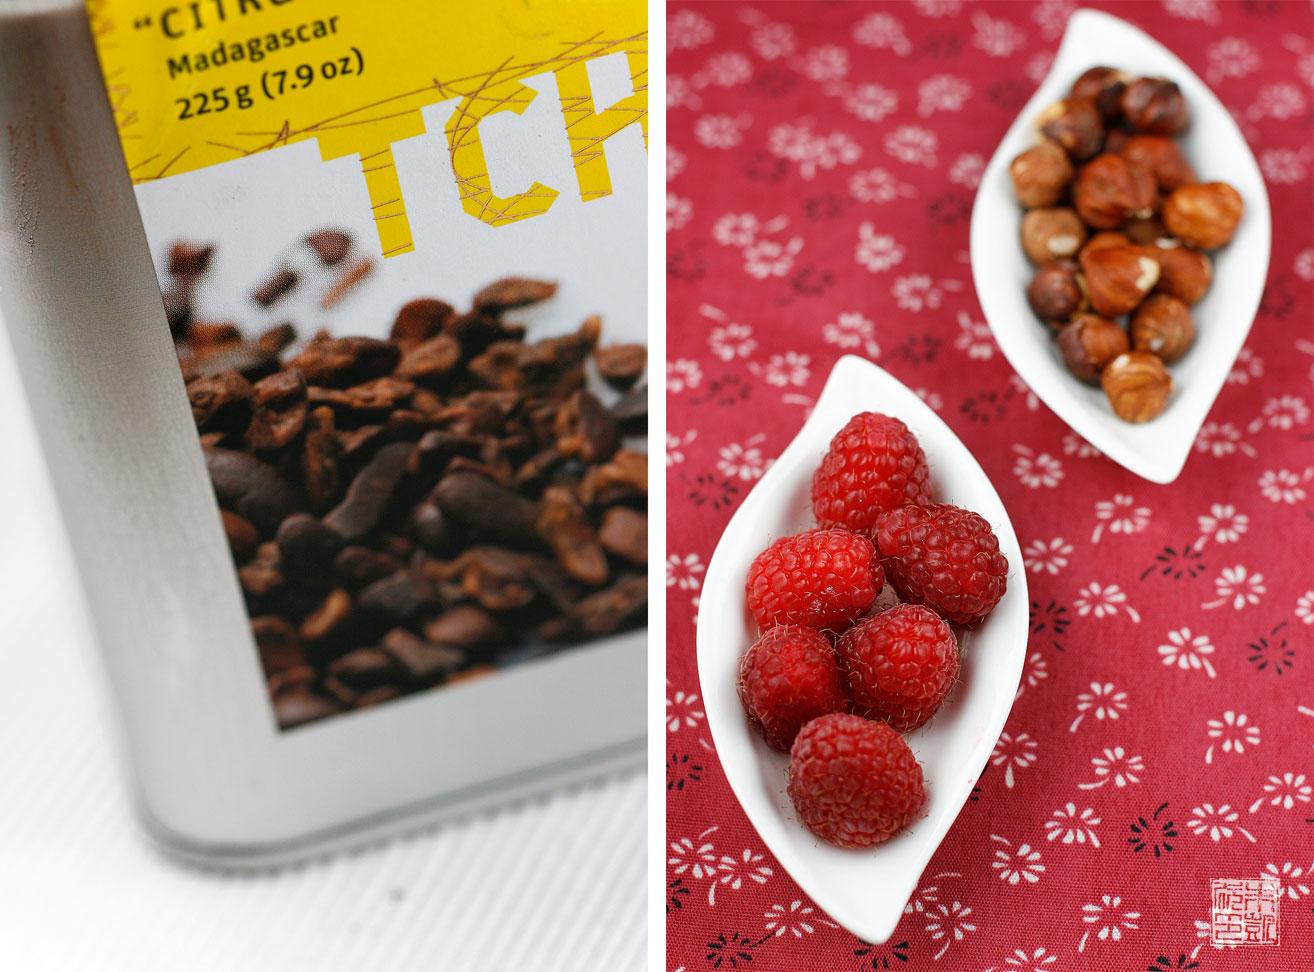 Raspberry Cocoa Nib Coffee Cake with Hazelnut Streusel